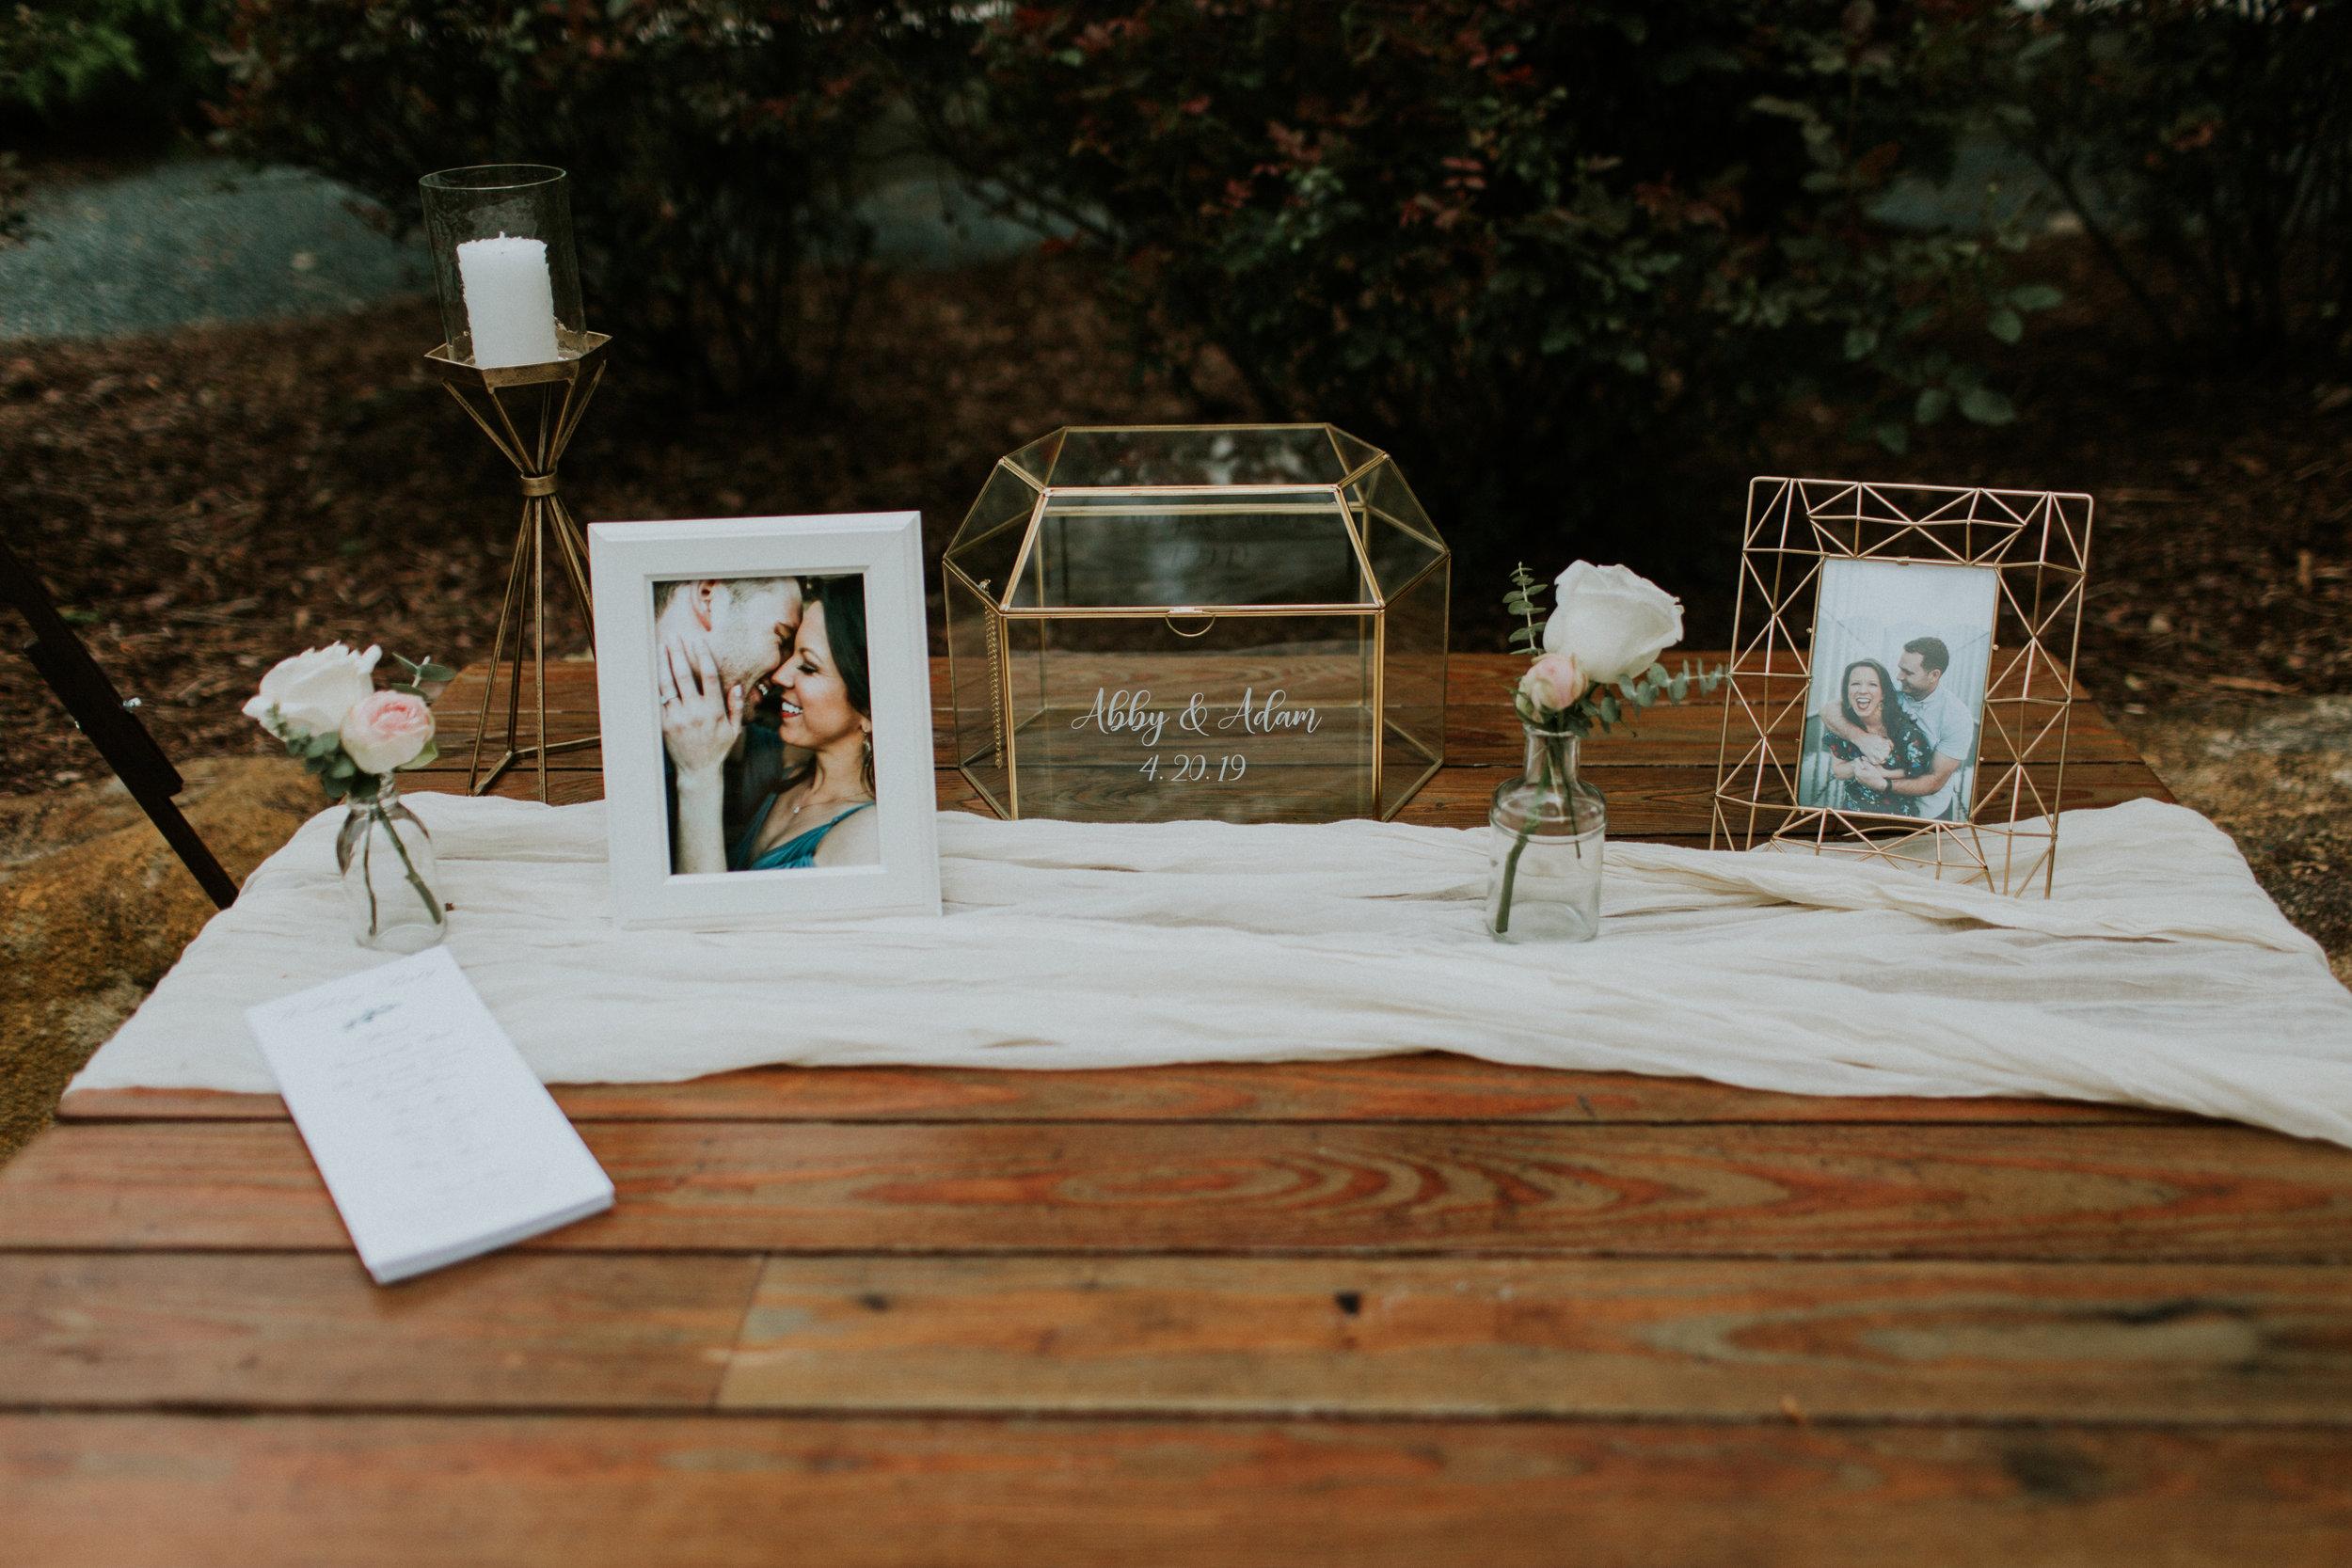 Christian_Reyes_Photography_Triad_NC_Wedding_Photographer-31.jpg